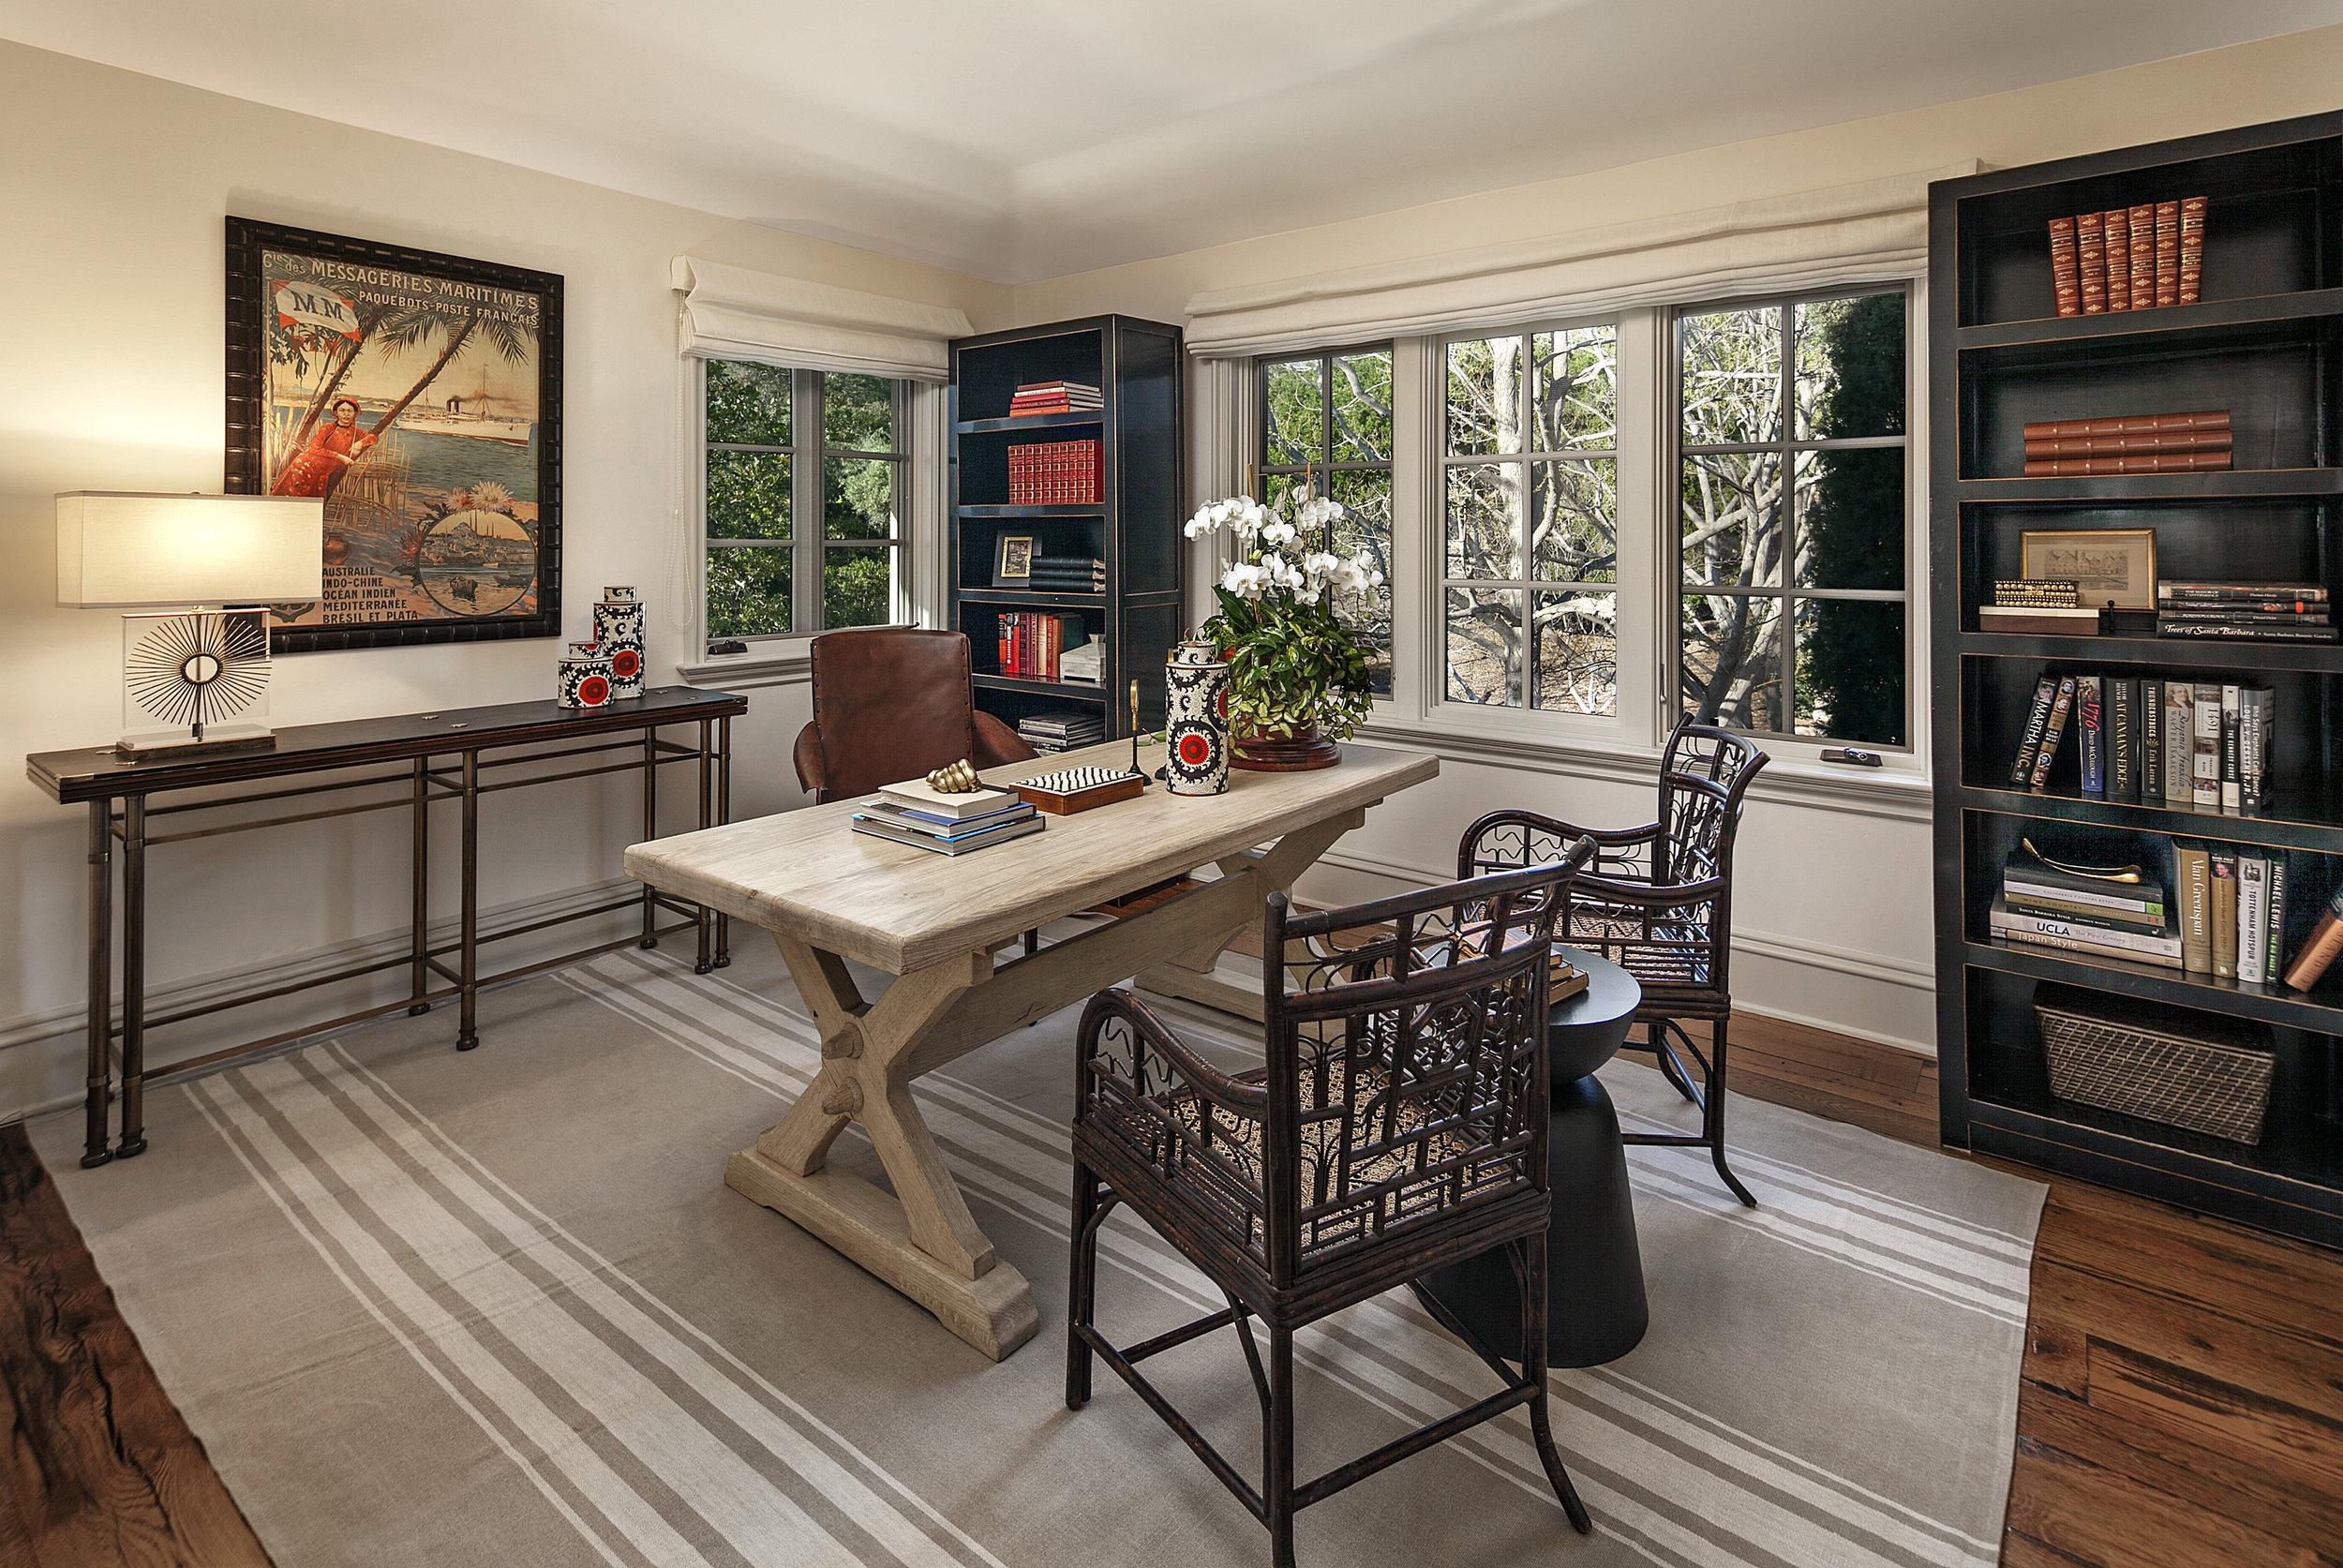 Property for Sale: 610 Cima Vista Lane, Montecito, CA 93108 List Price: $9,995,000 6 Beds 7 Bath Main House 1 Bed 1 Bath Guest House 8,572 Sq Ft Sophisticated Tuscan Villa!